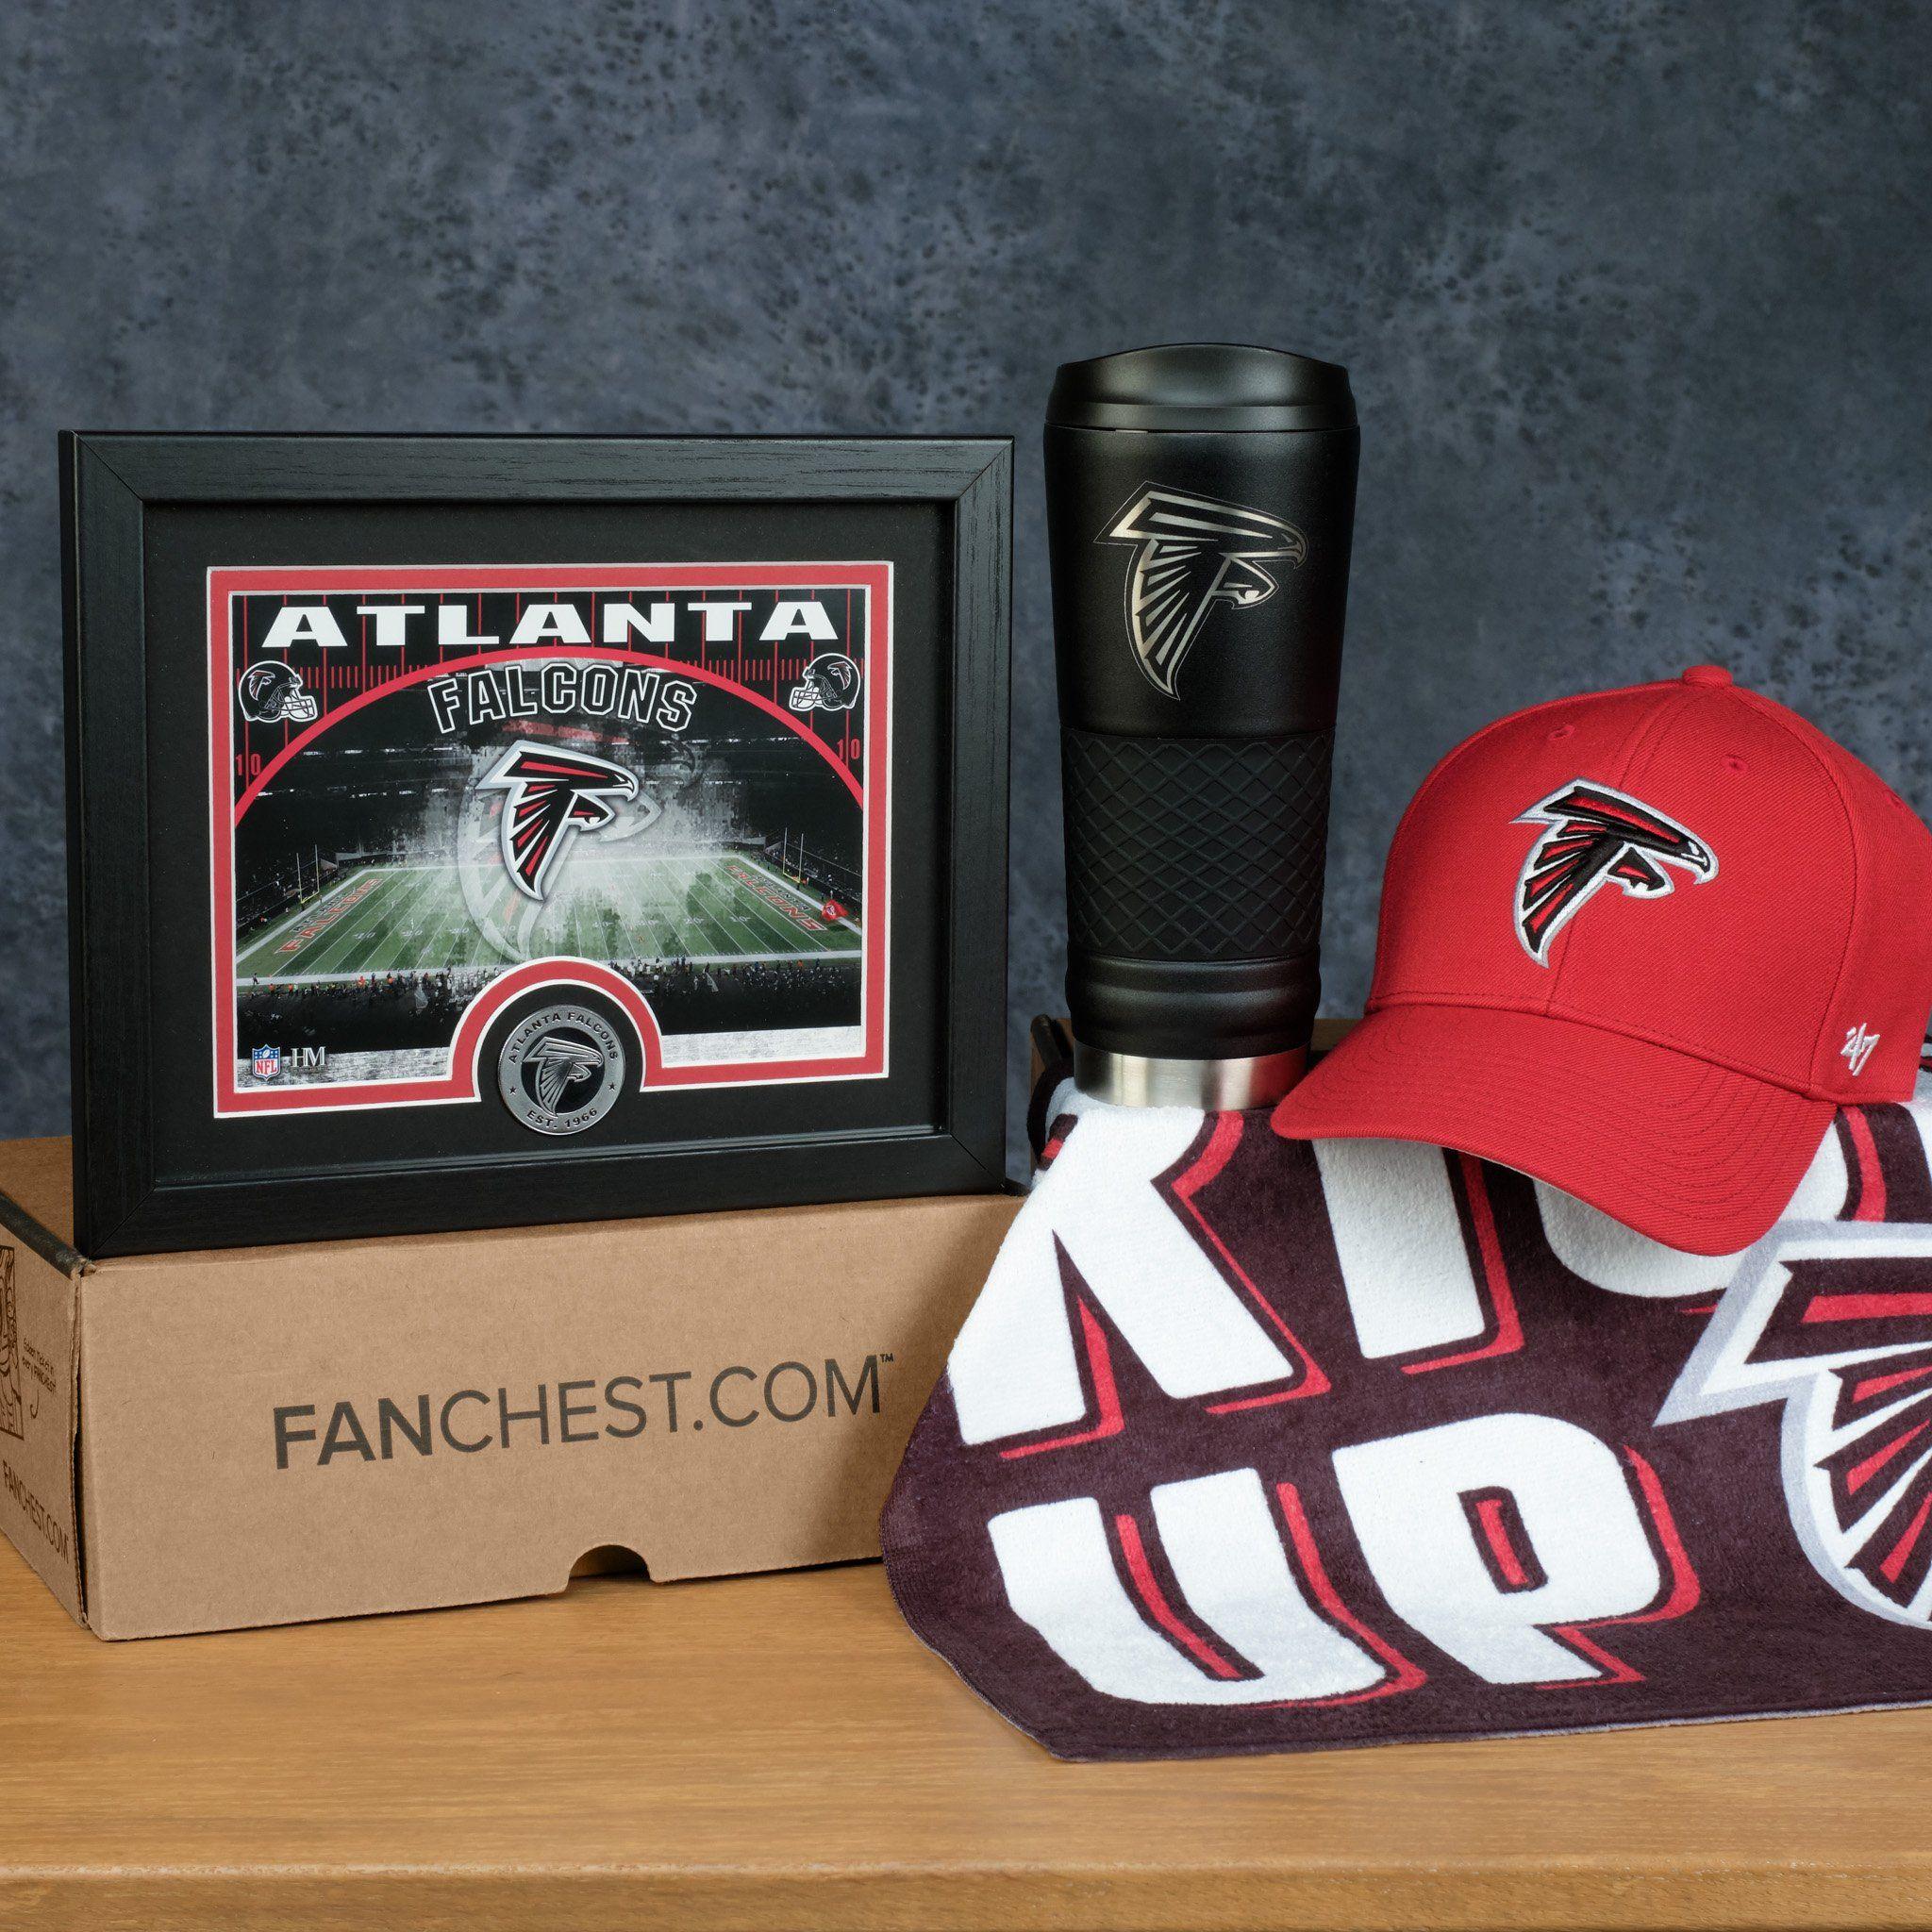 Atlanta Falcons Gift Box Premium Falcons Gear Fanchest Atlanta Falcons Gifts Atlanta Falcons Atlanta Falcons Baby